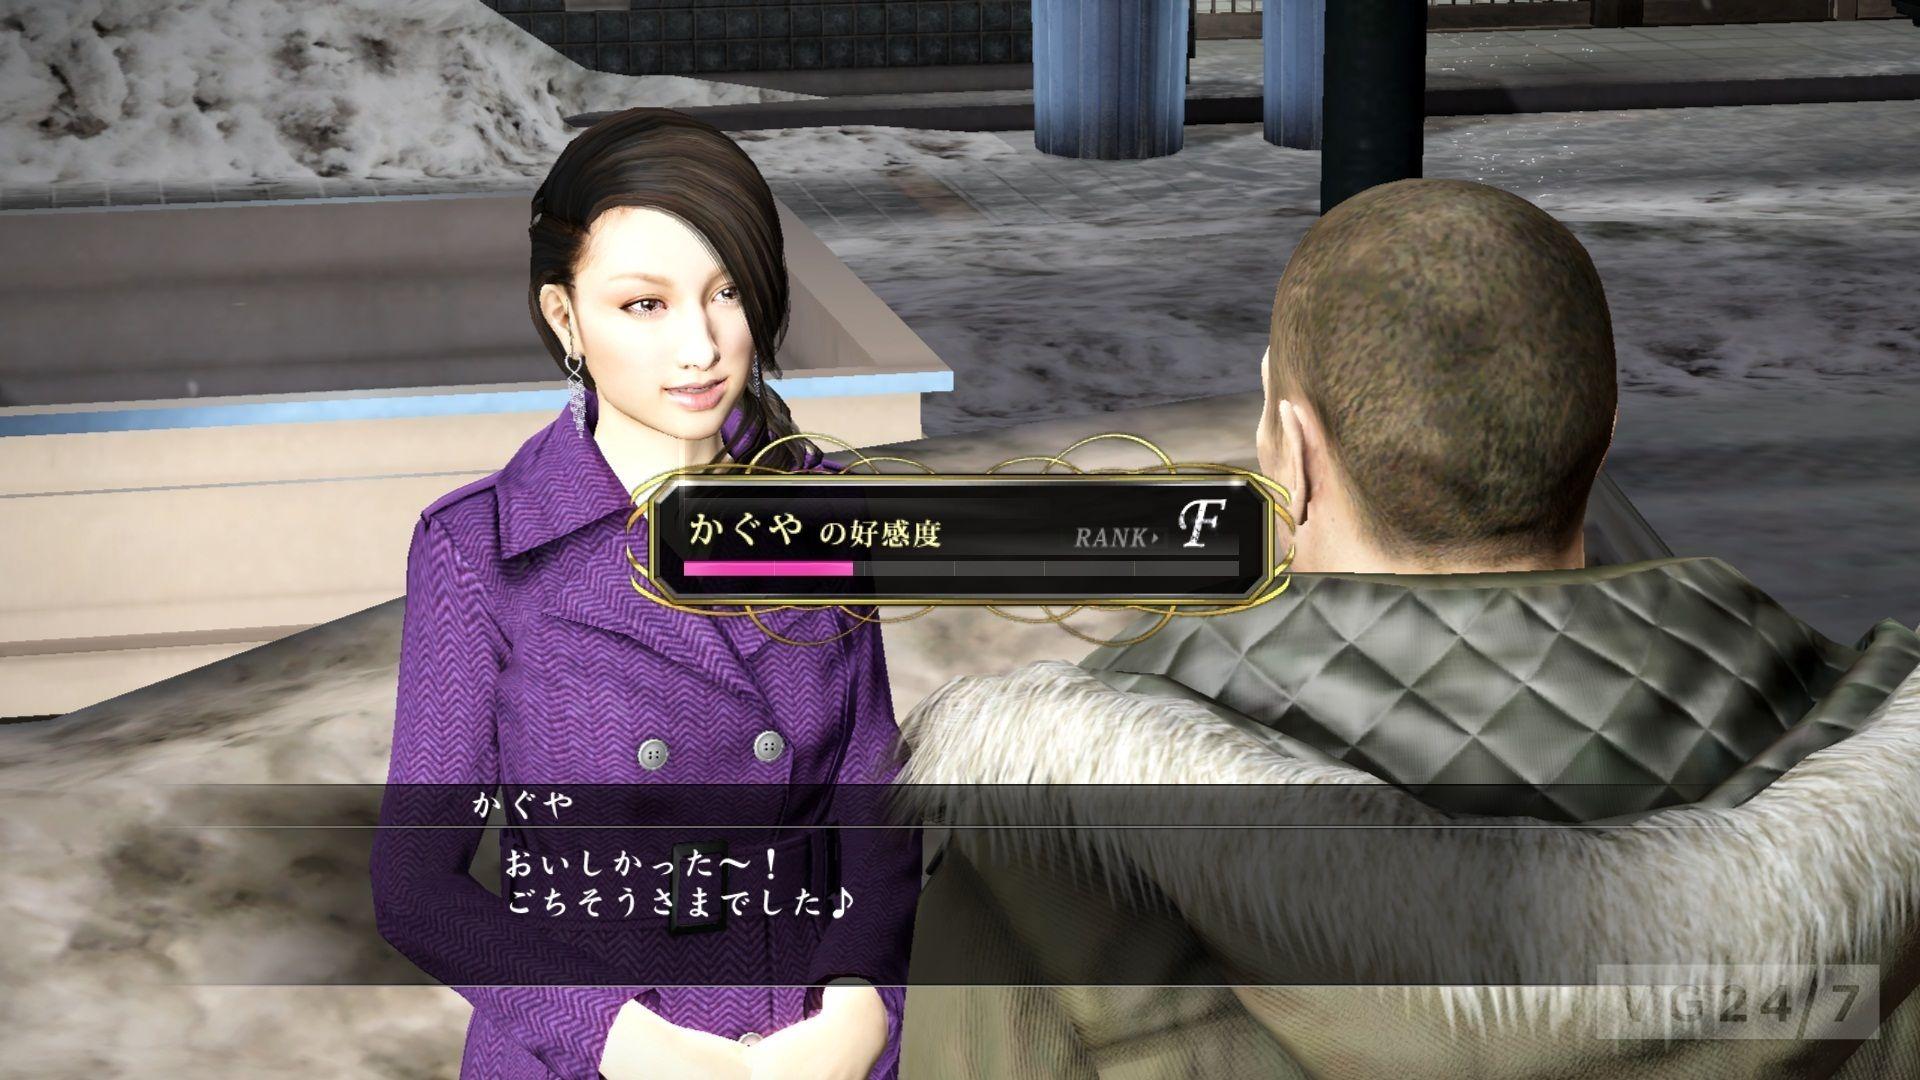 Yakuza 5 Hostess Dating Detailed Screens Show You How To